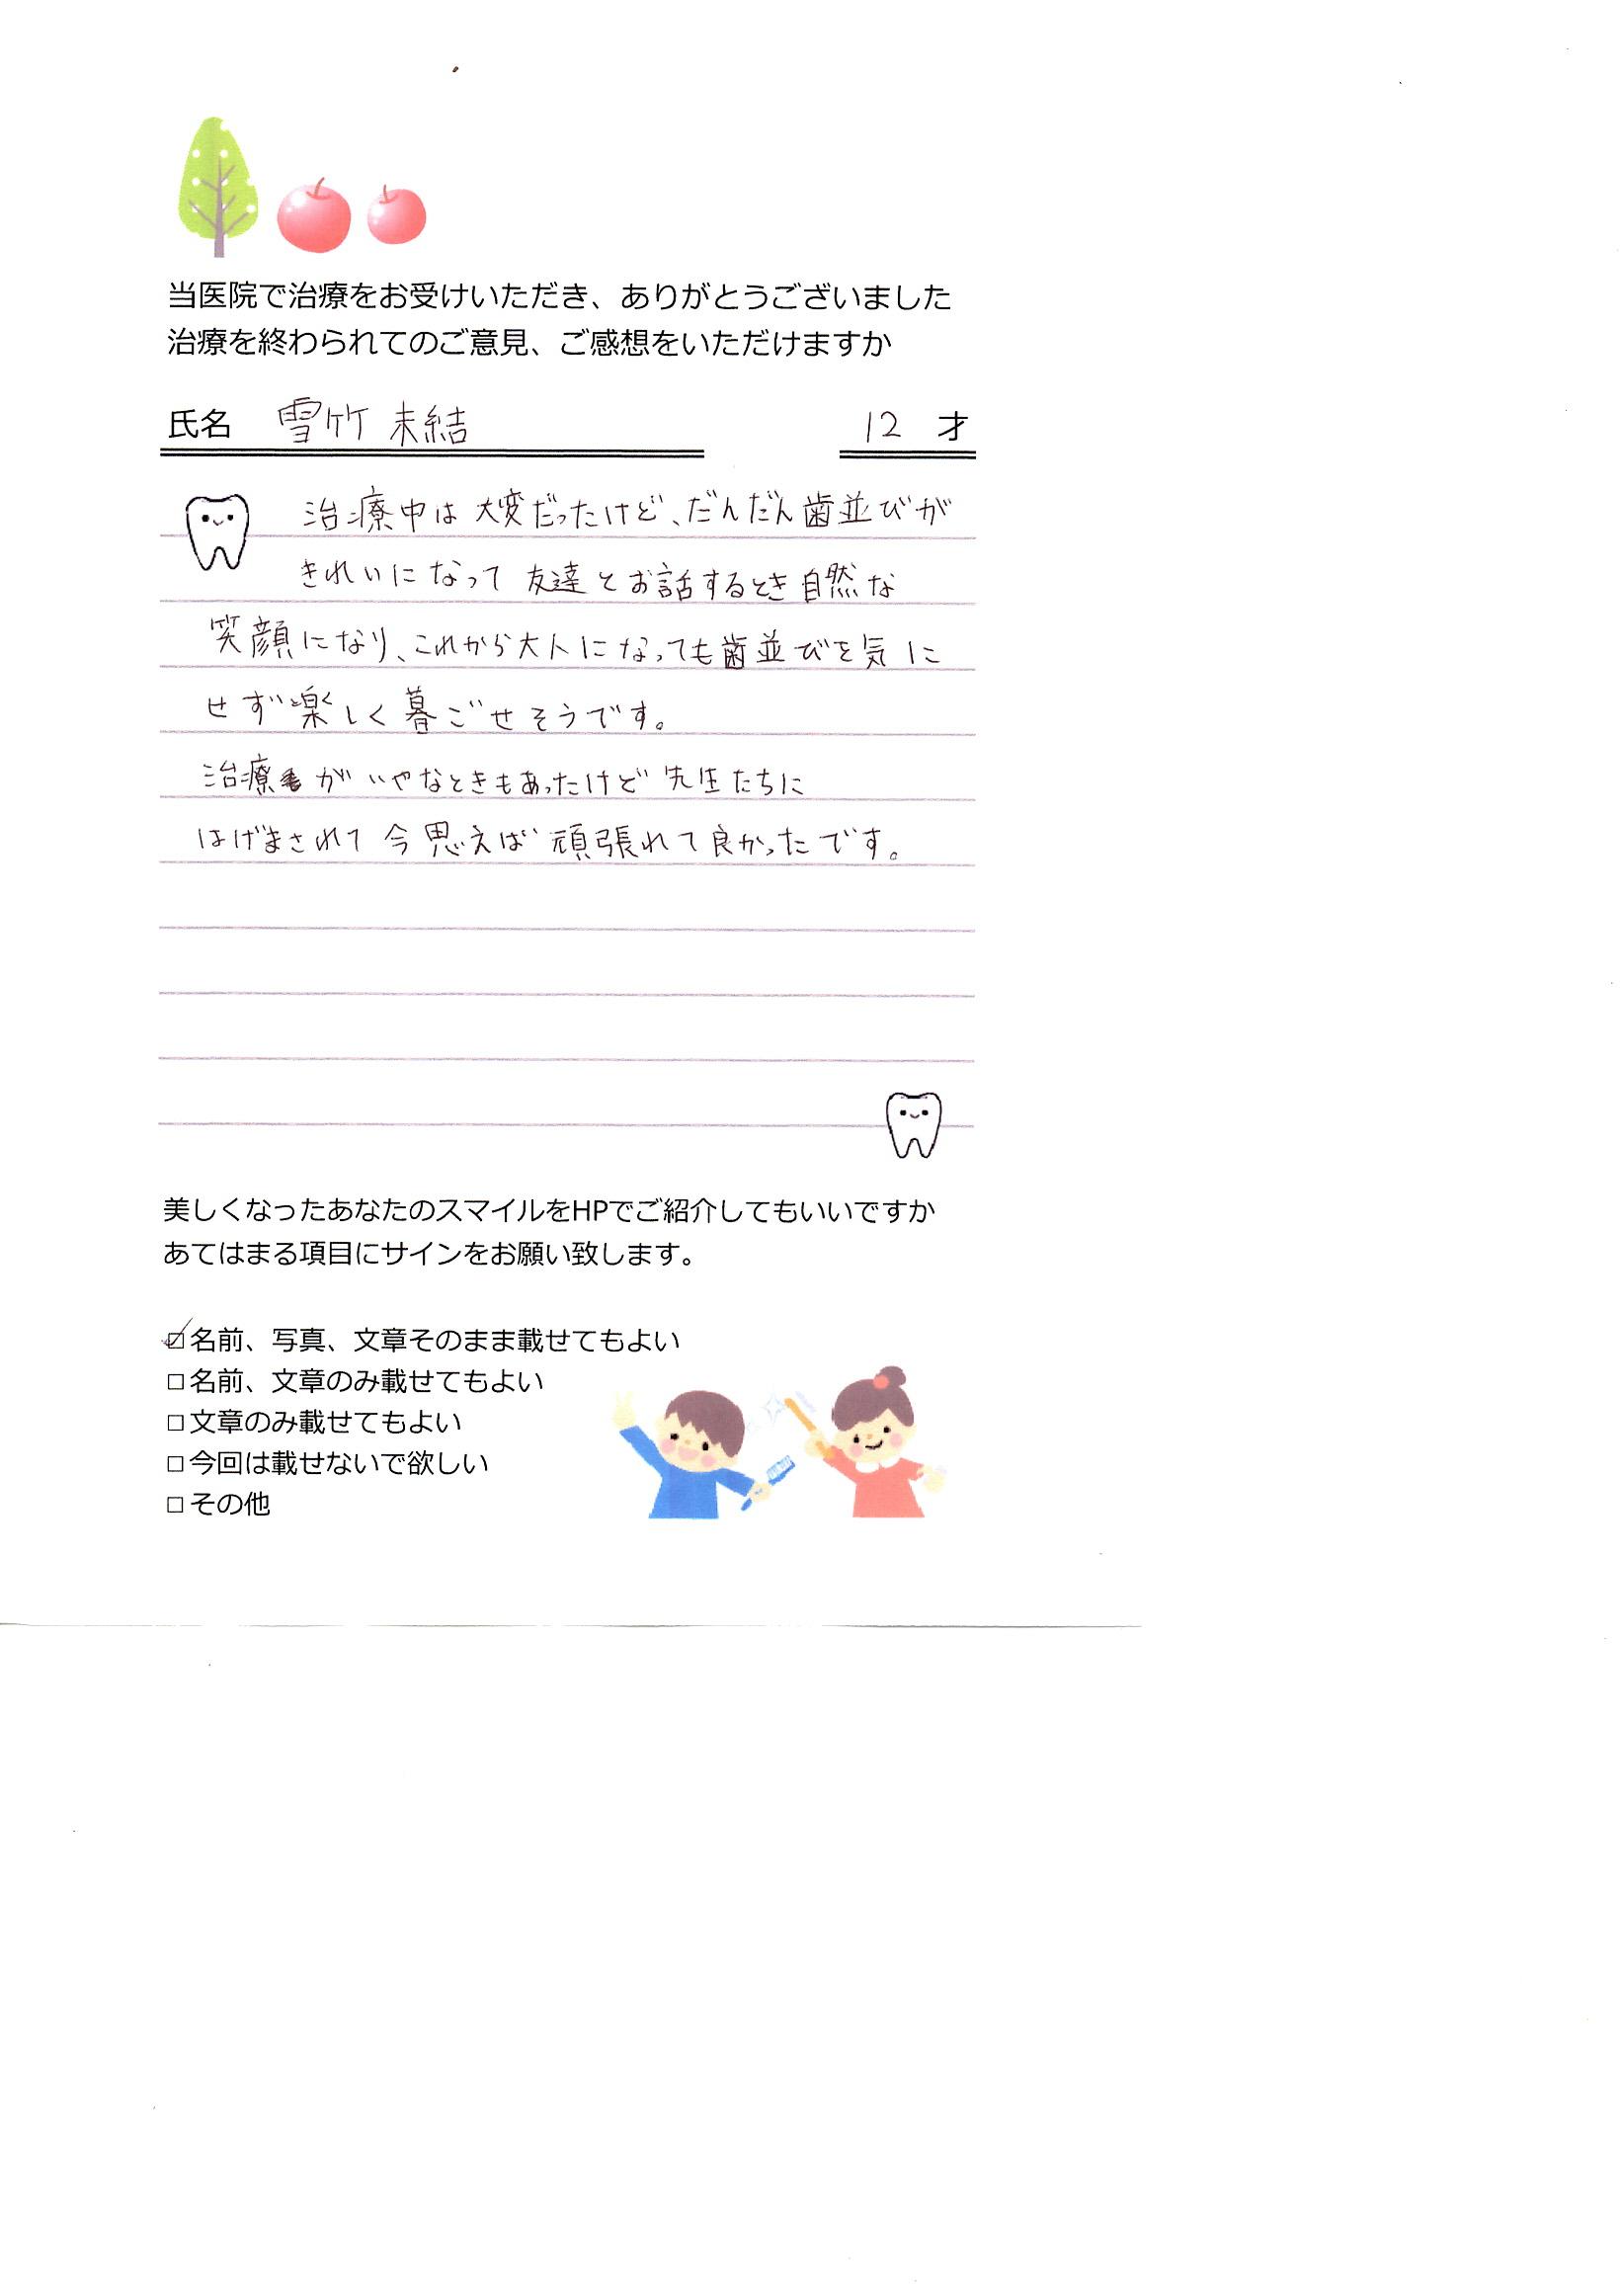 EPSON057.JPG